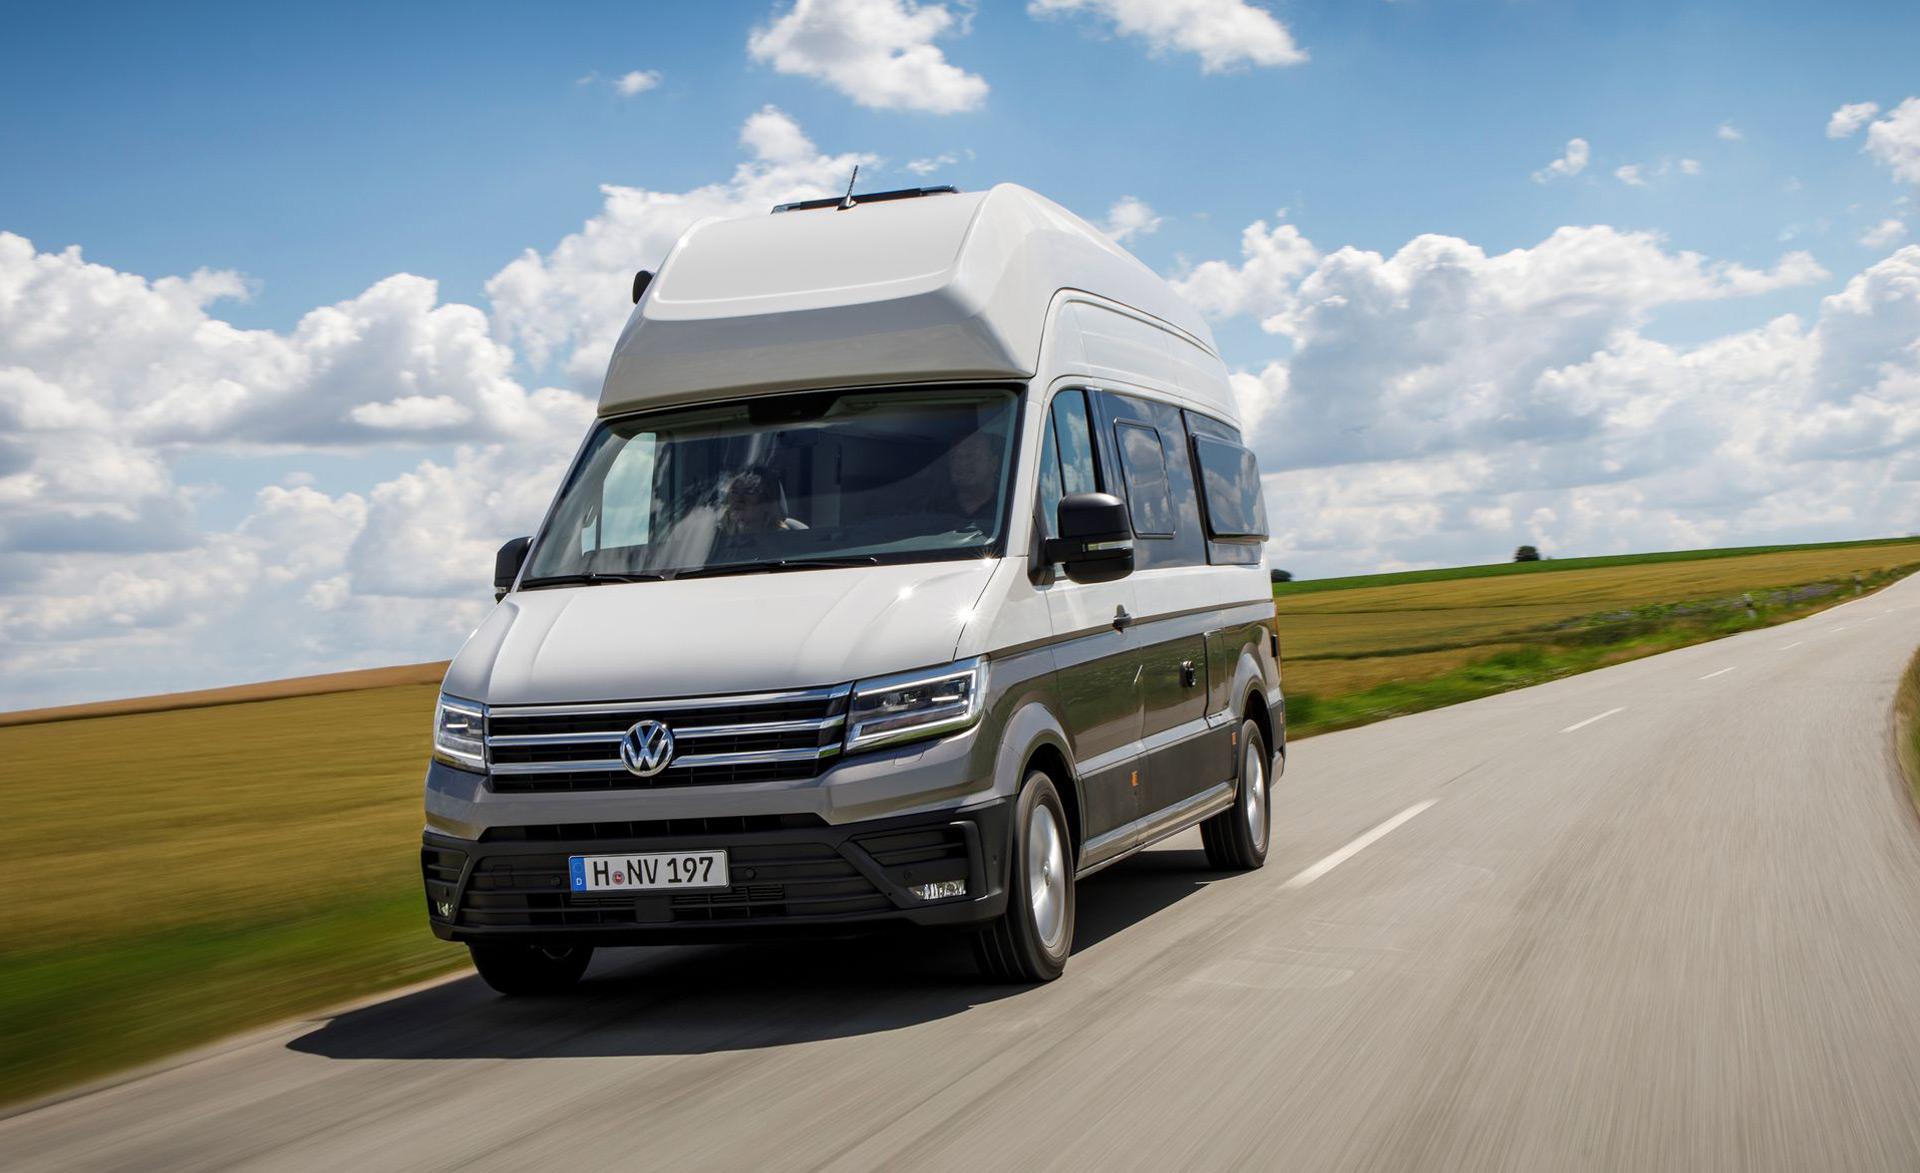 Volkswagen Grand California Comes With Bathroom Bunk Bed